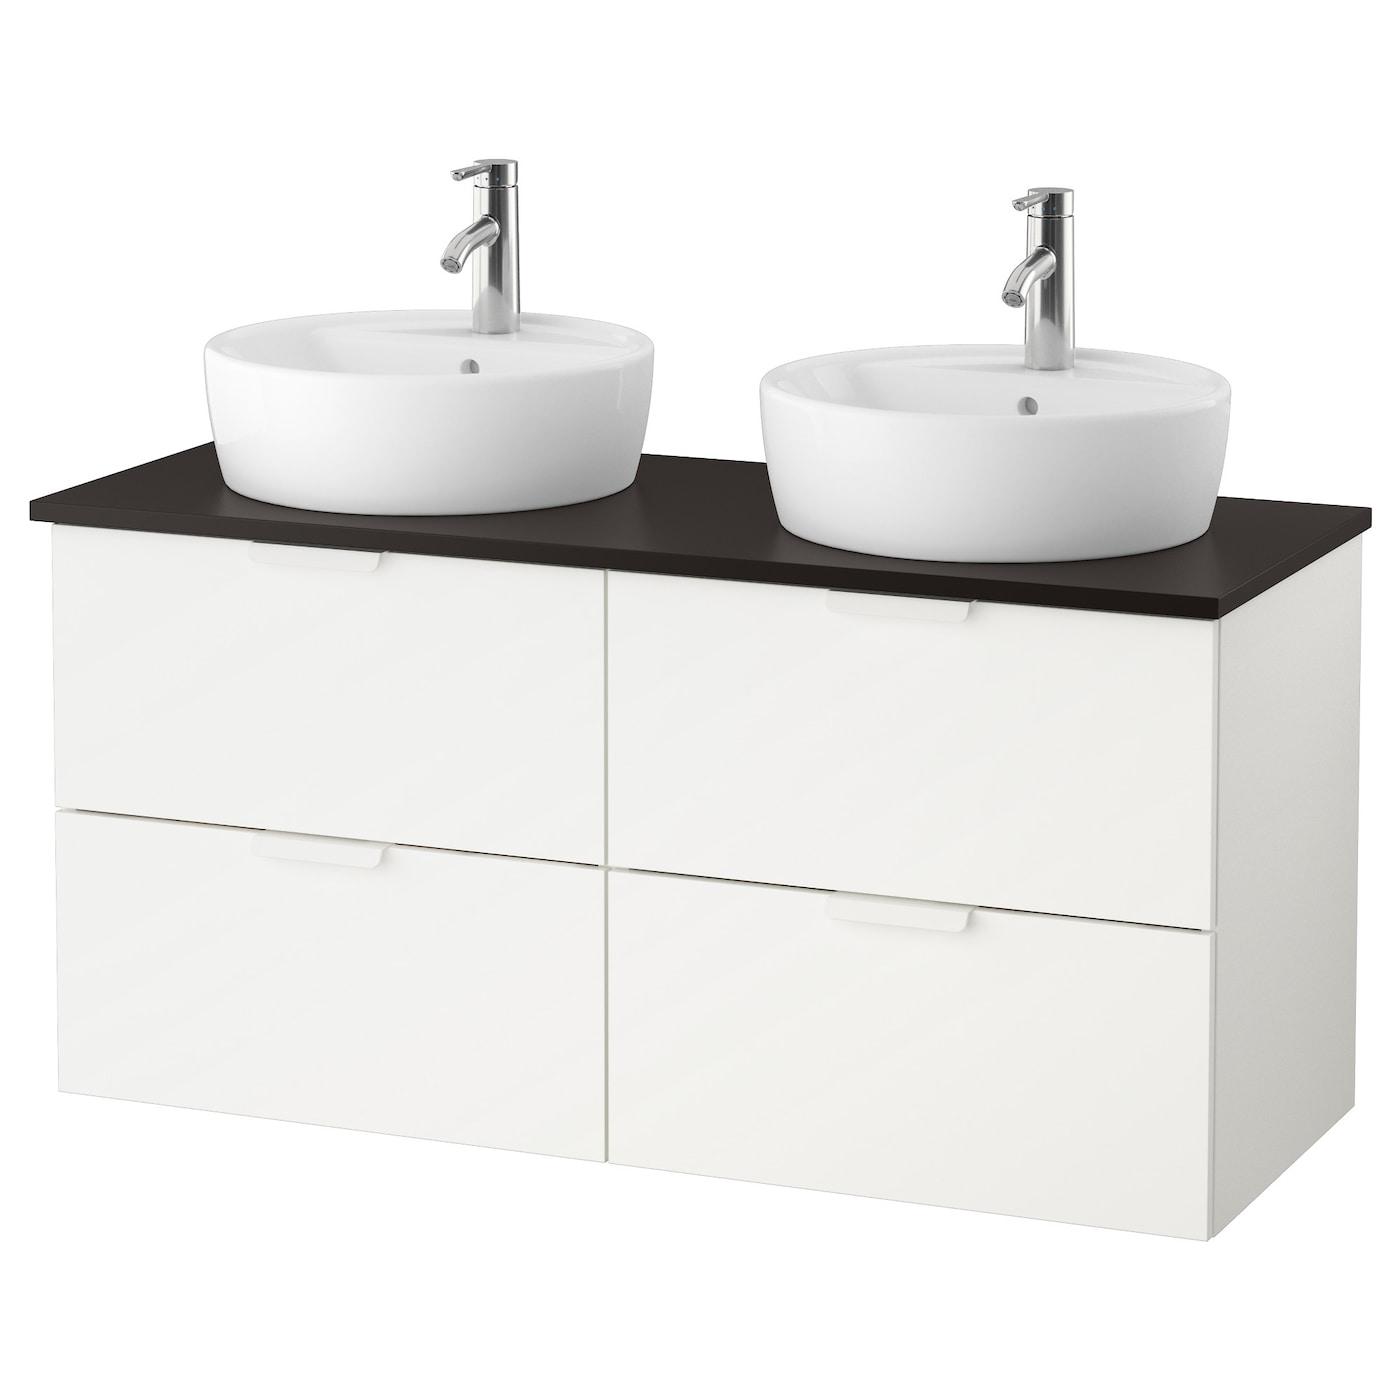 godmorgon tolken t rnviken wastafelcombinatie 45 v bovenblad wit antraciet 122x49x74 cm ikea. Black Bedroom Furniture Sets. Home Design Ideas